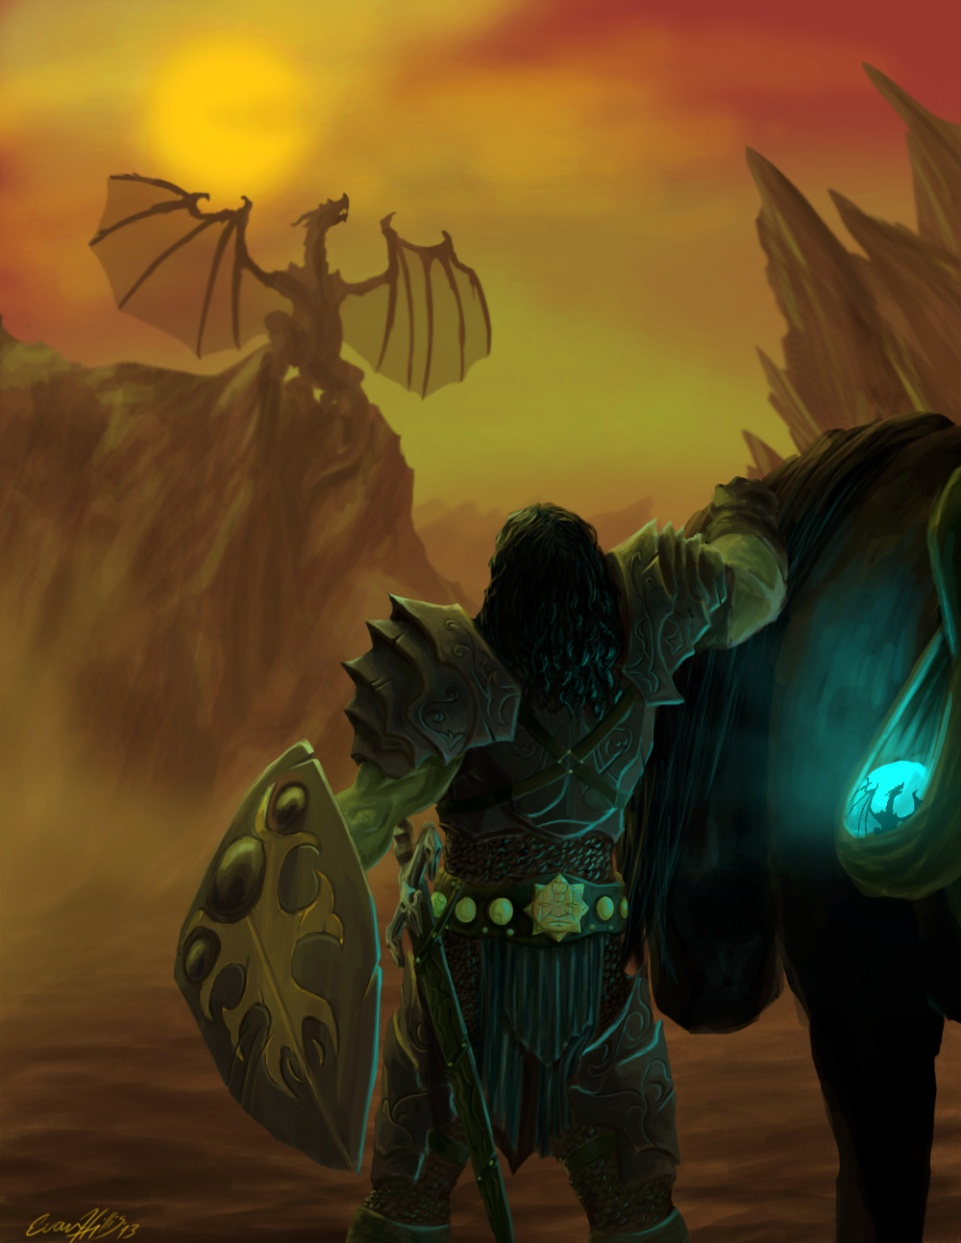 Dragon Slayer vibrant